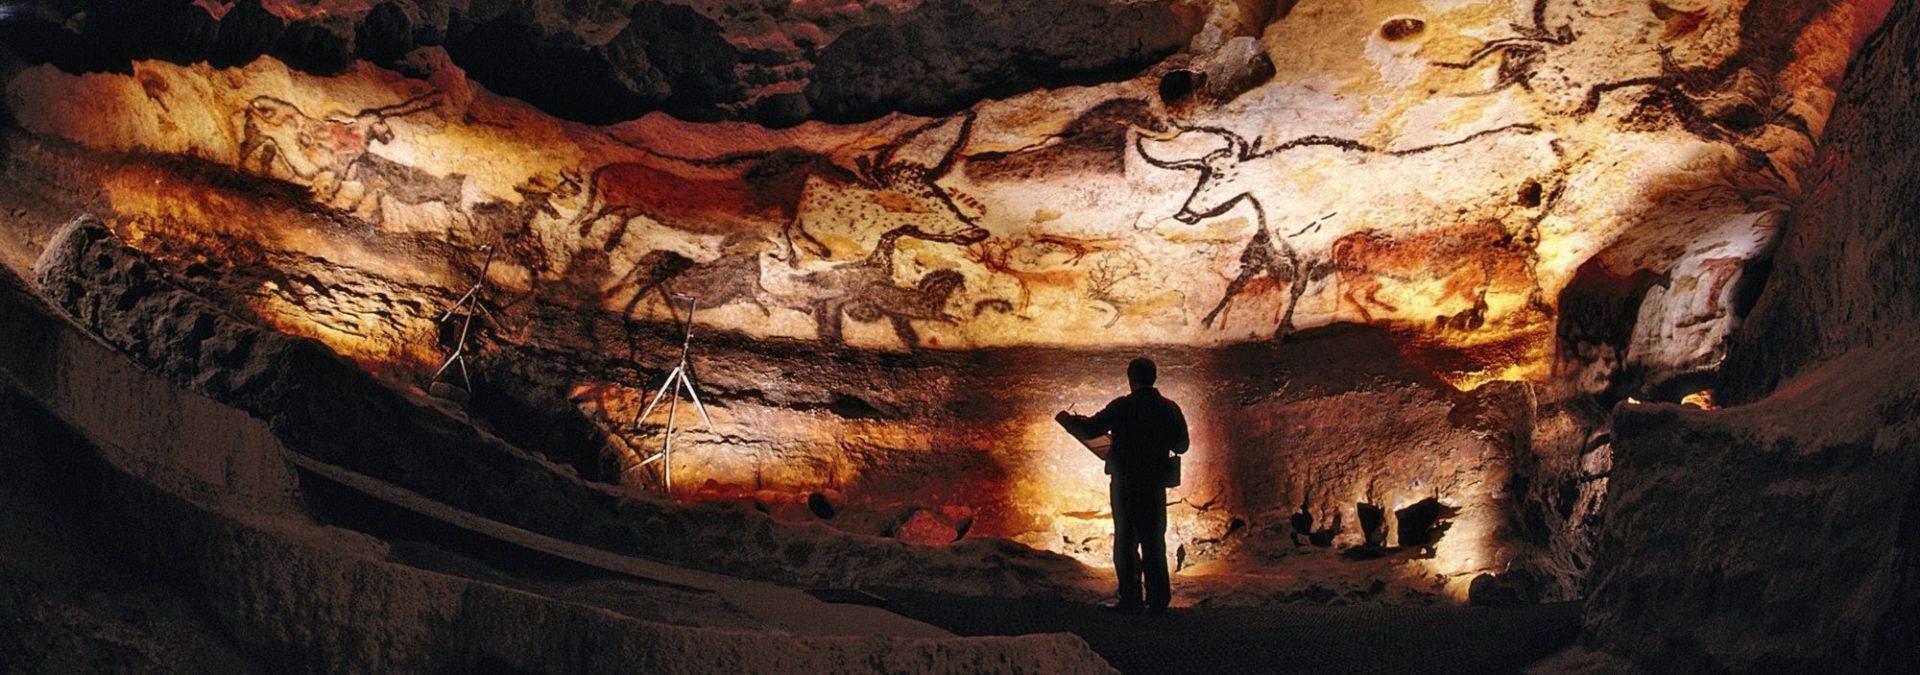 Cueva de Altamira Pintura Rupestre